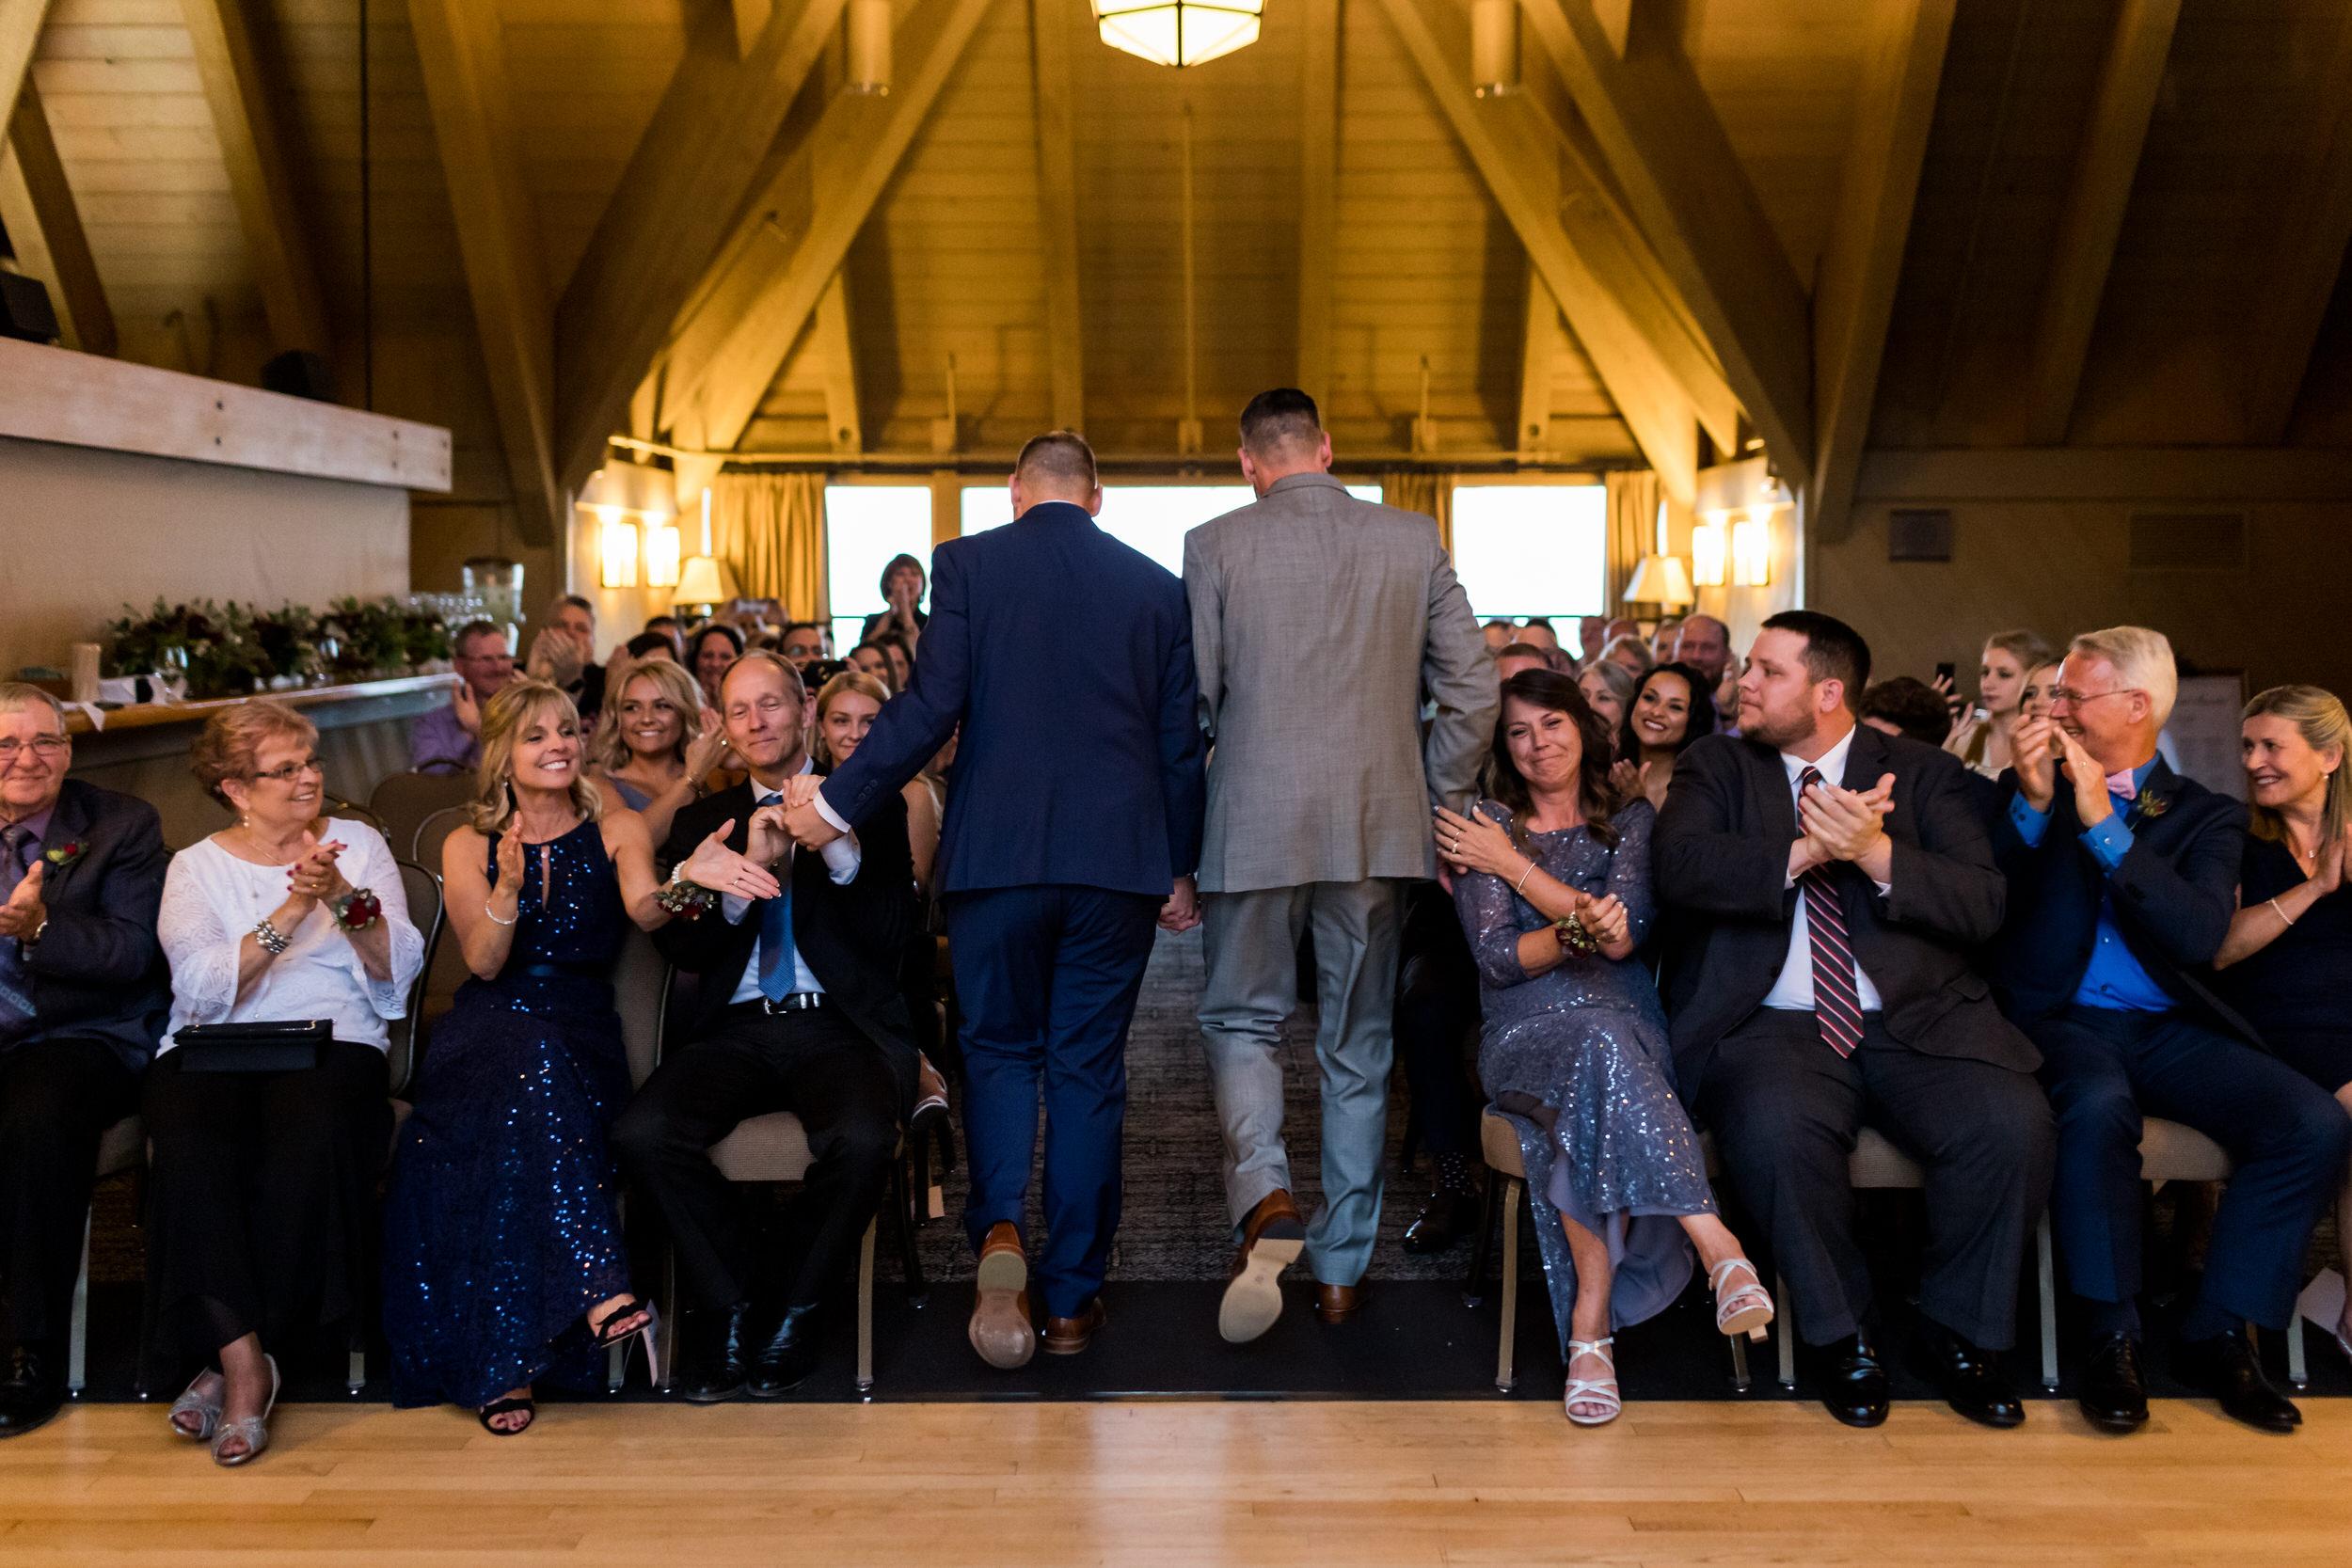 timberline_lodge_wedding_coltonjames_011